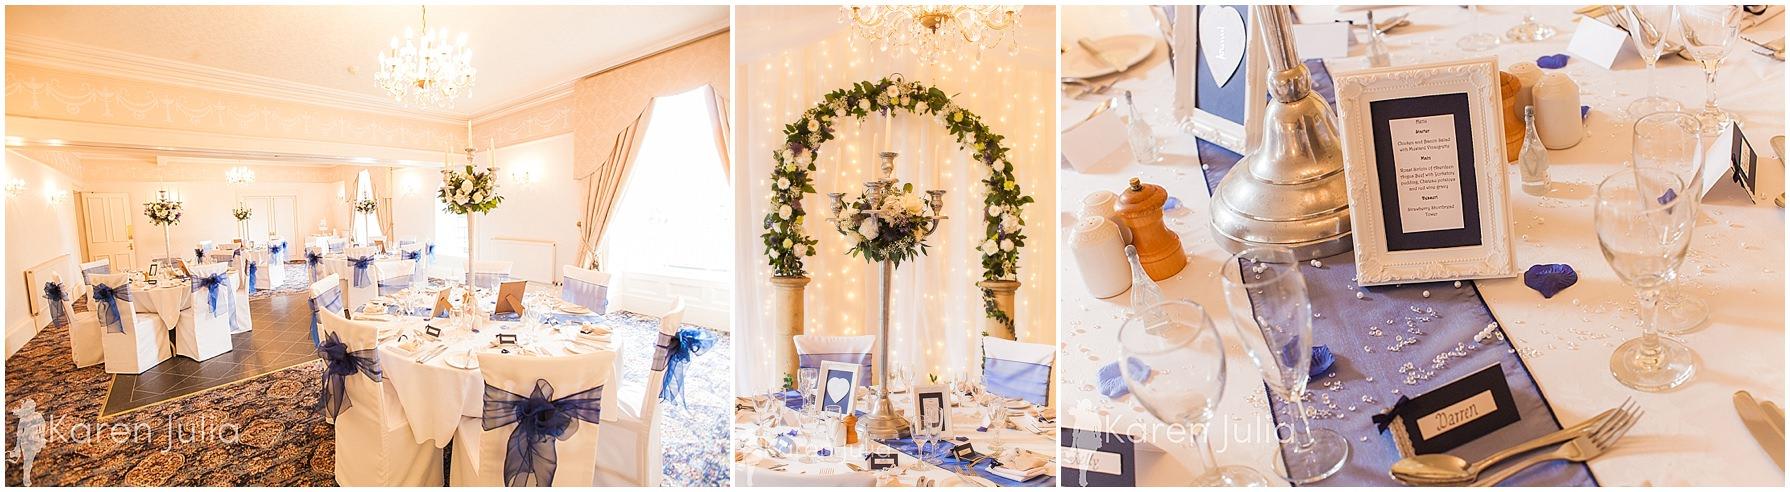 Spring-House-Hotel-Wedding-Photography-14